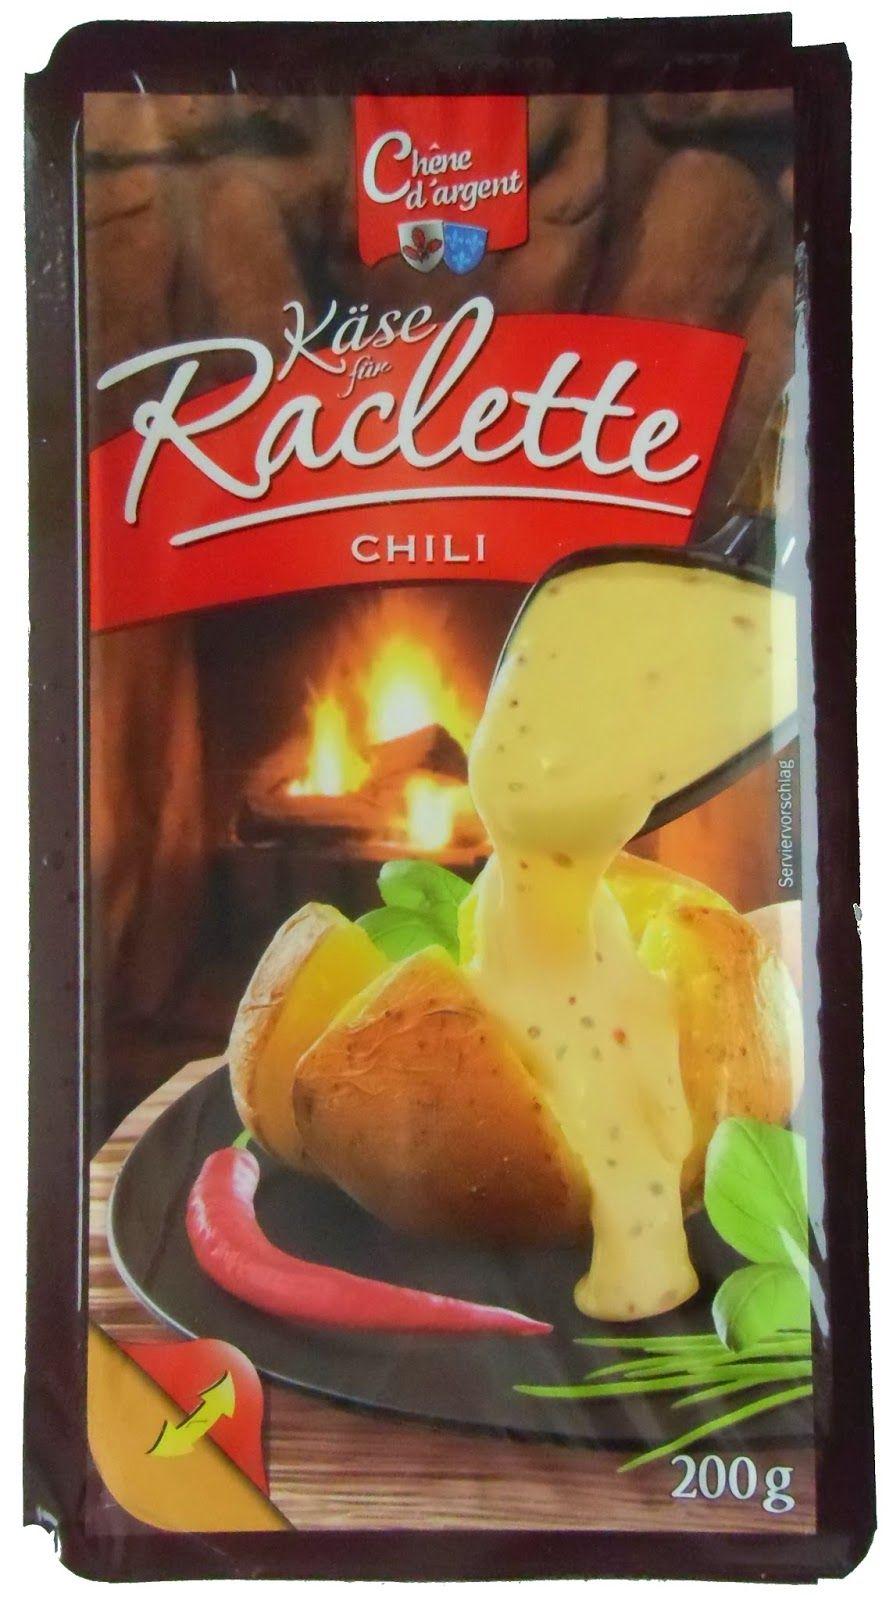 Chilihead Icewolf77 Lidl Chene D Argent Kase Fur Raclette Chili Chili Lidl Rezepte